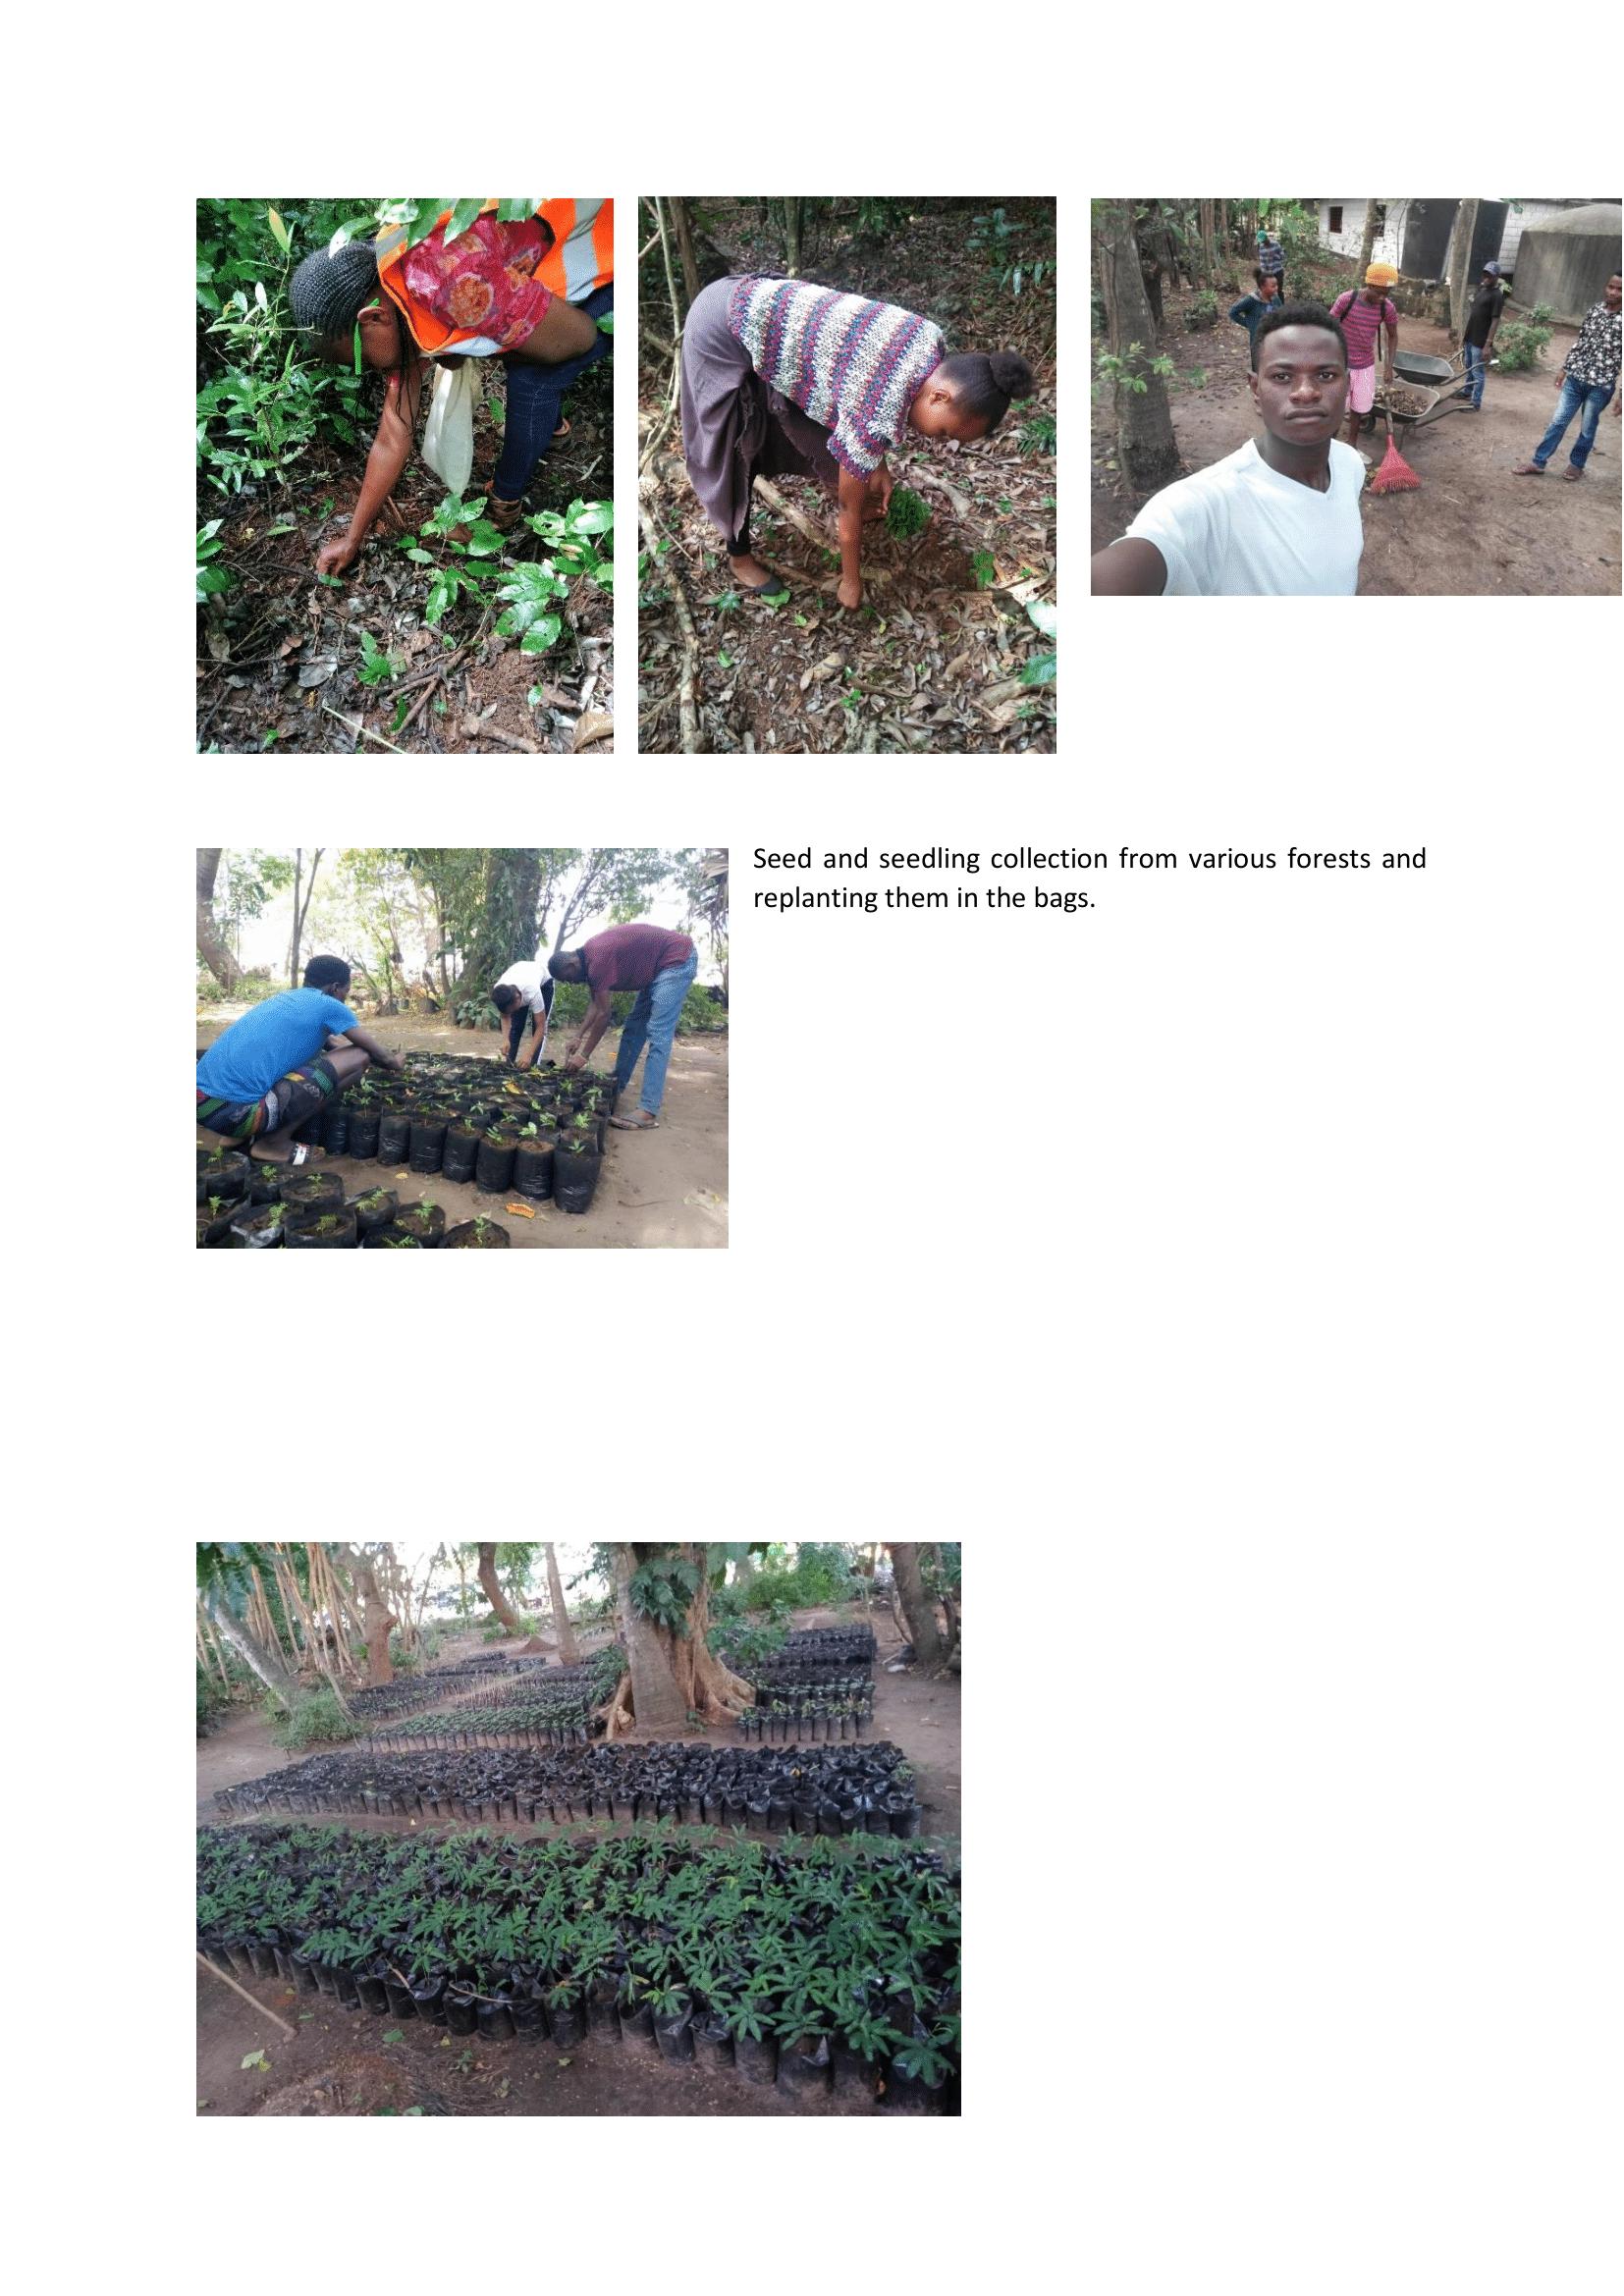 CarolineN_conserving nature and creating awareness-in-kenya - caroline njeri-5.png